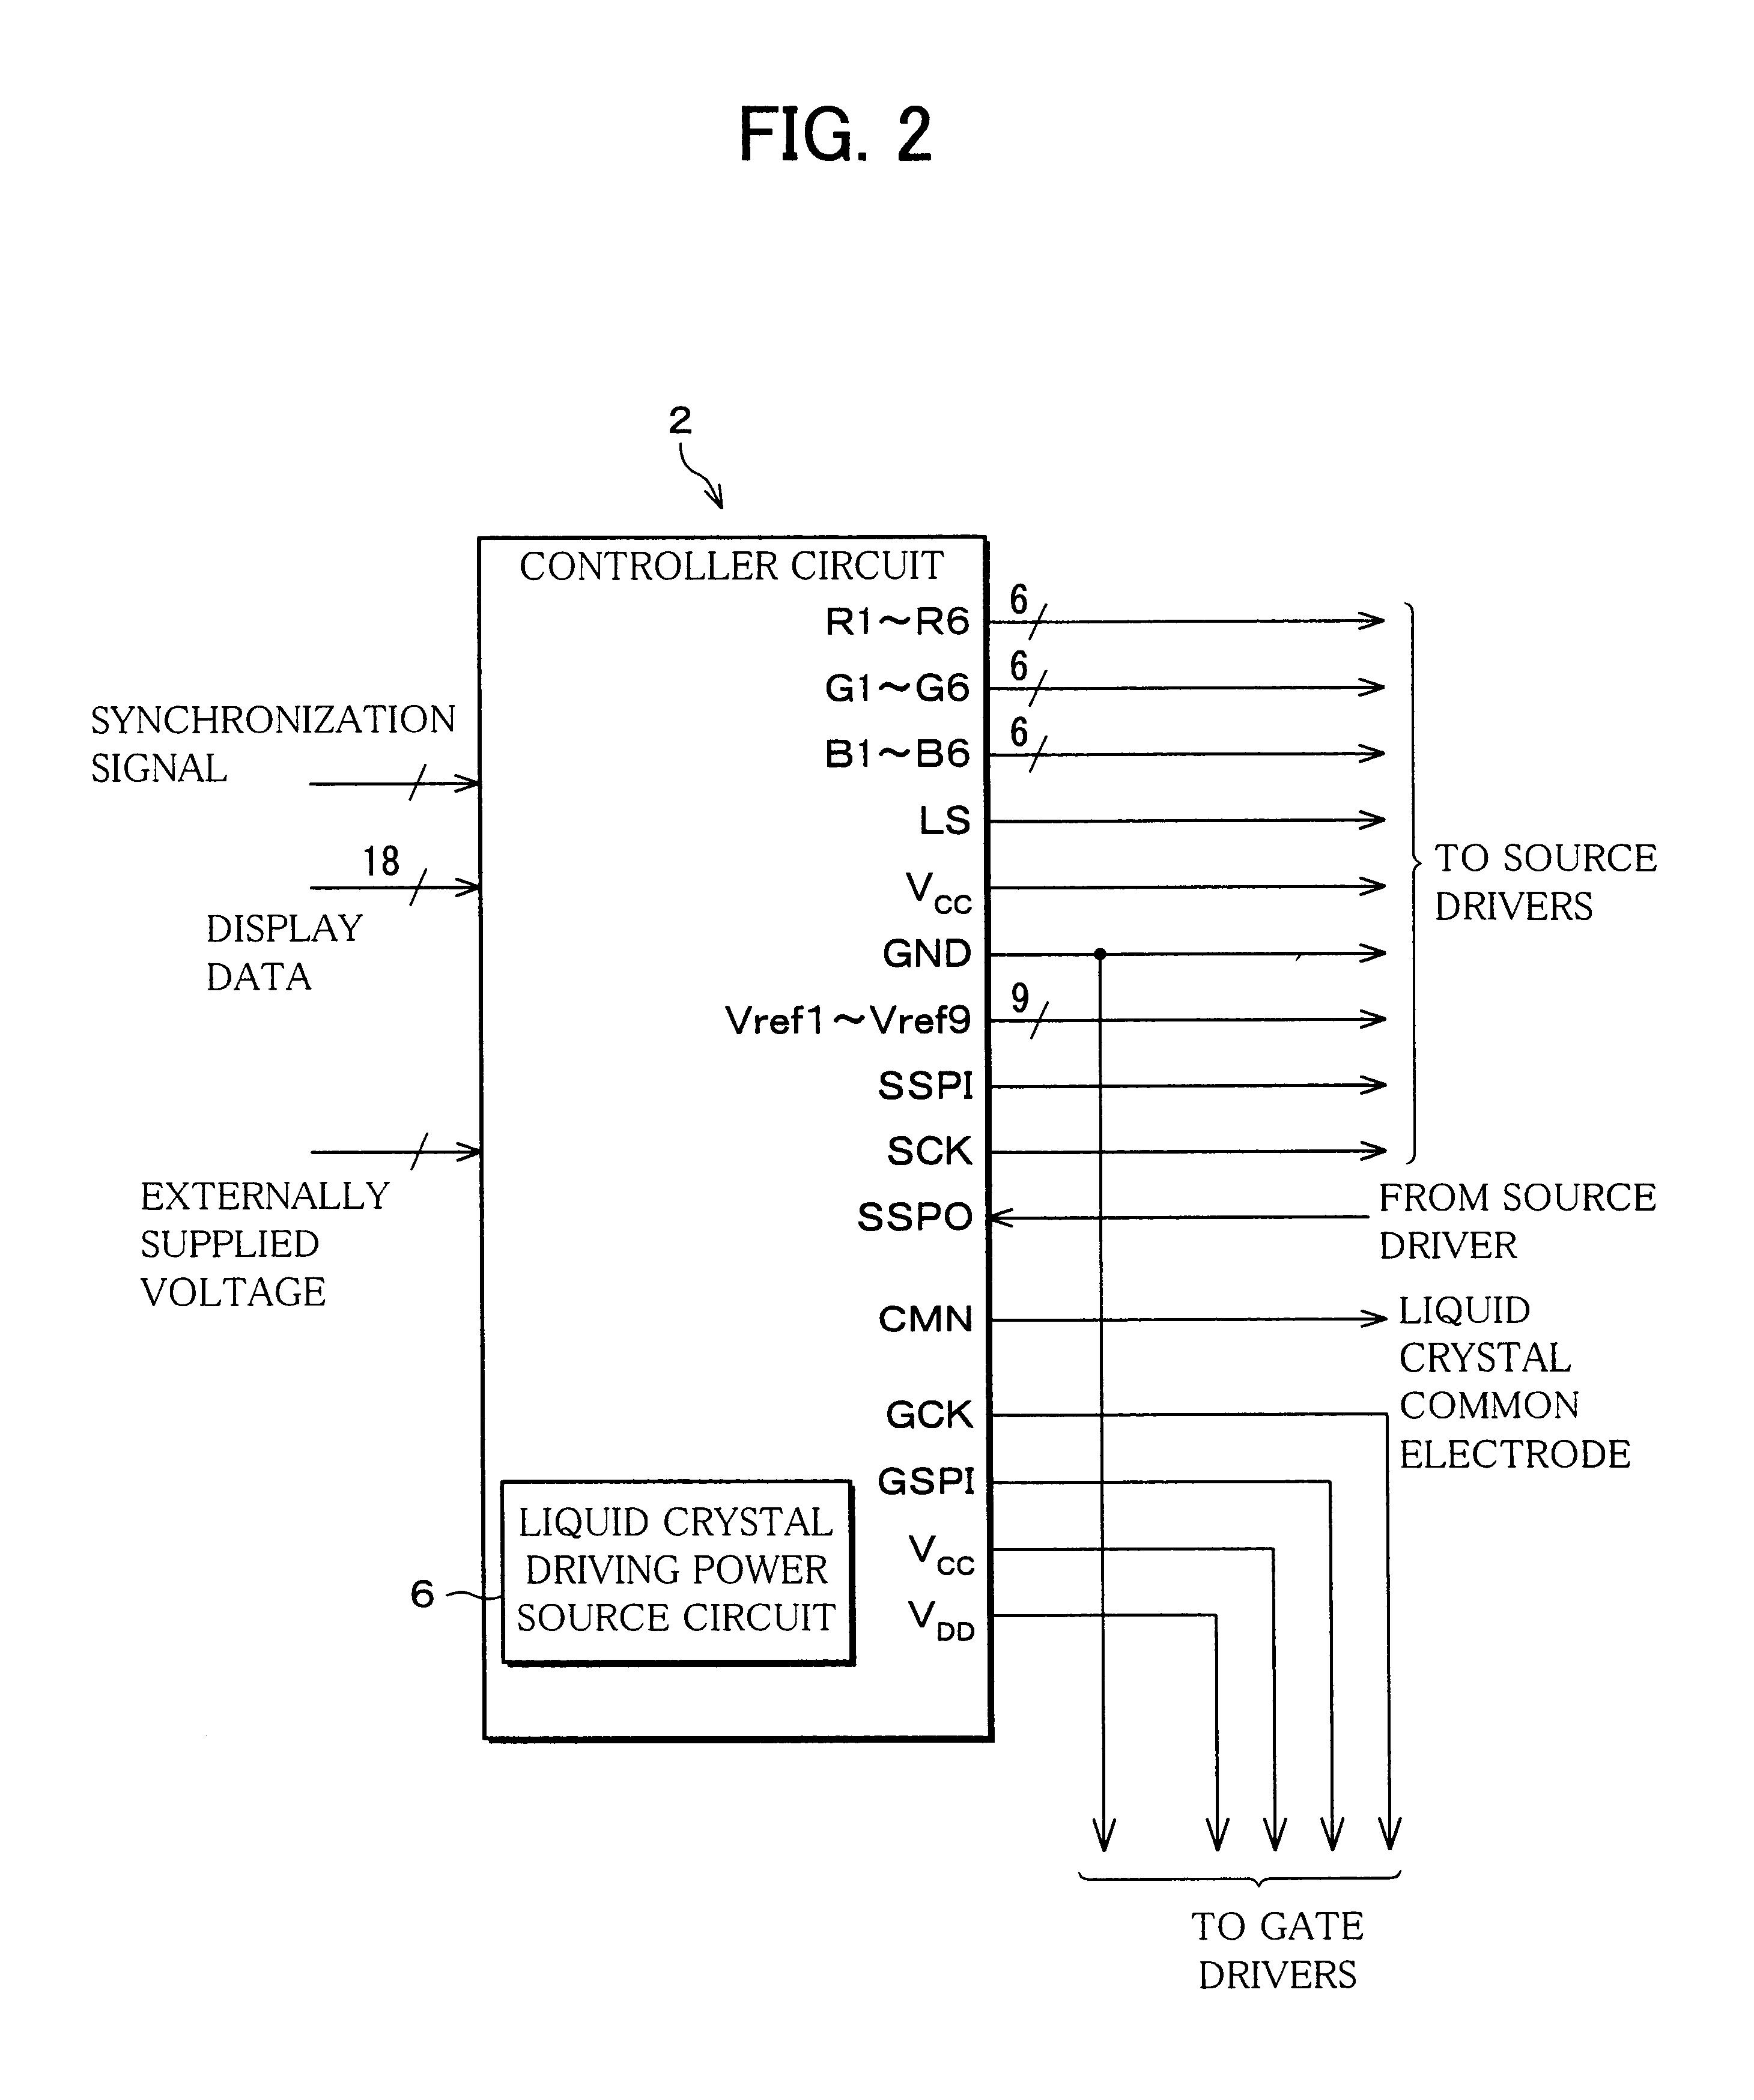 True Gdm 26 Wiring Diagram Get Free Image About Wiring Diagram